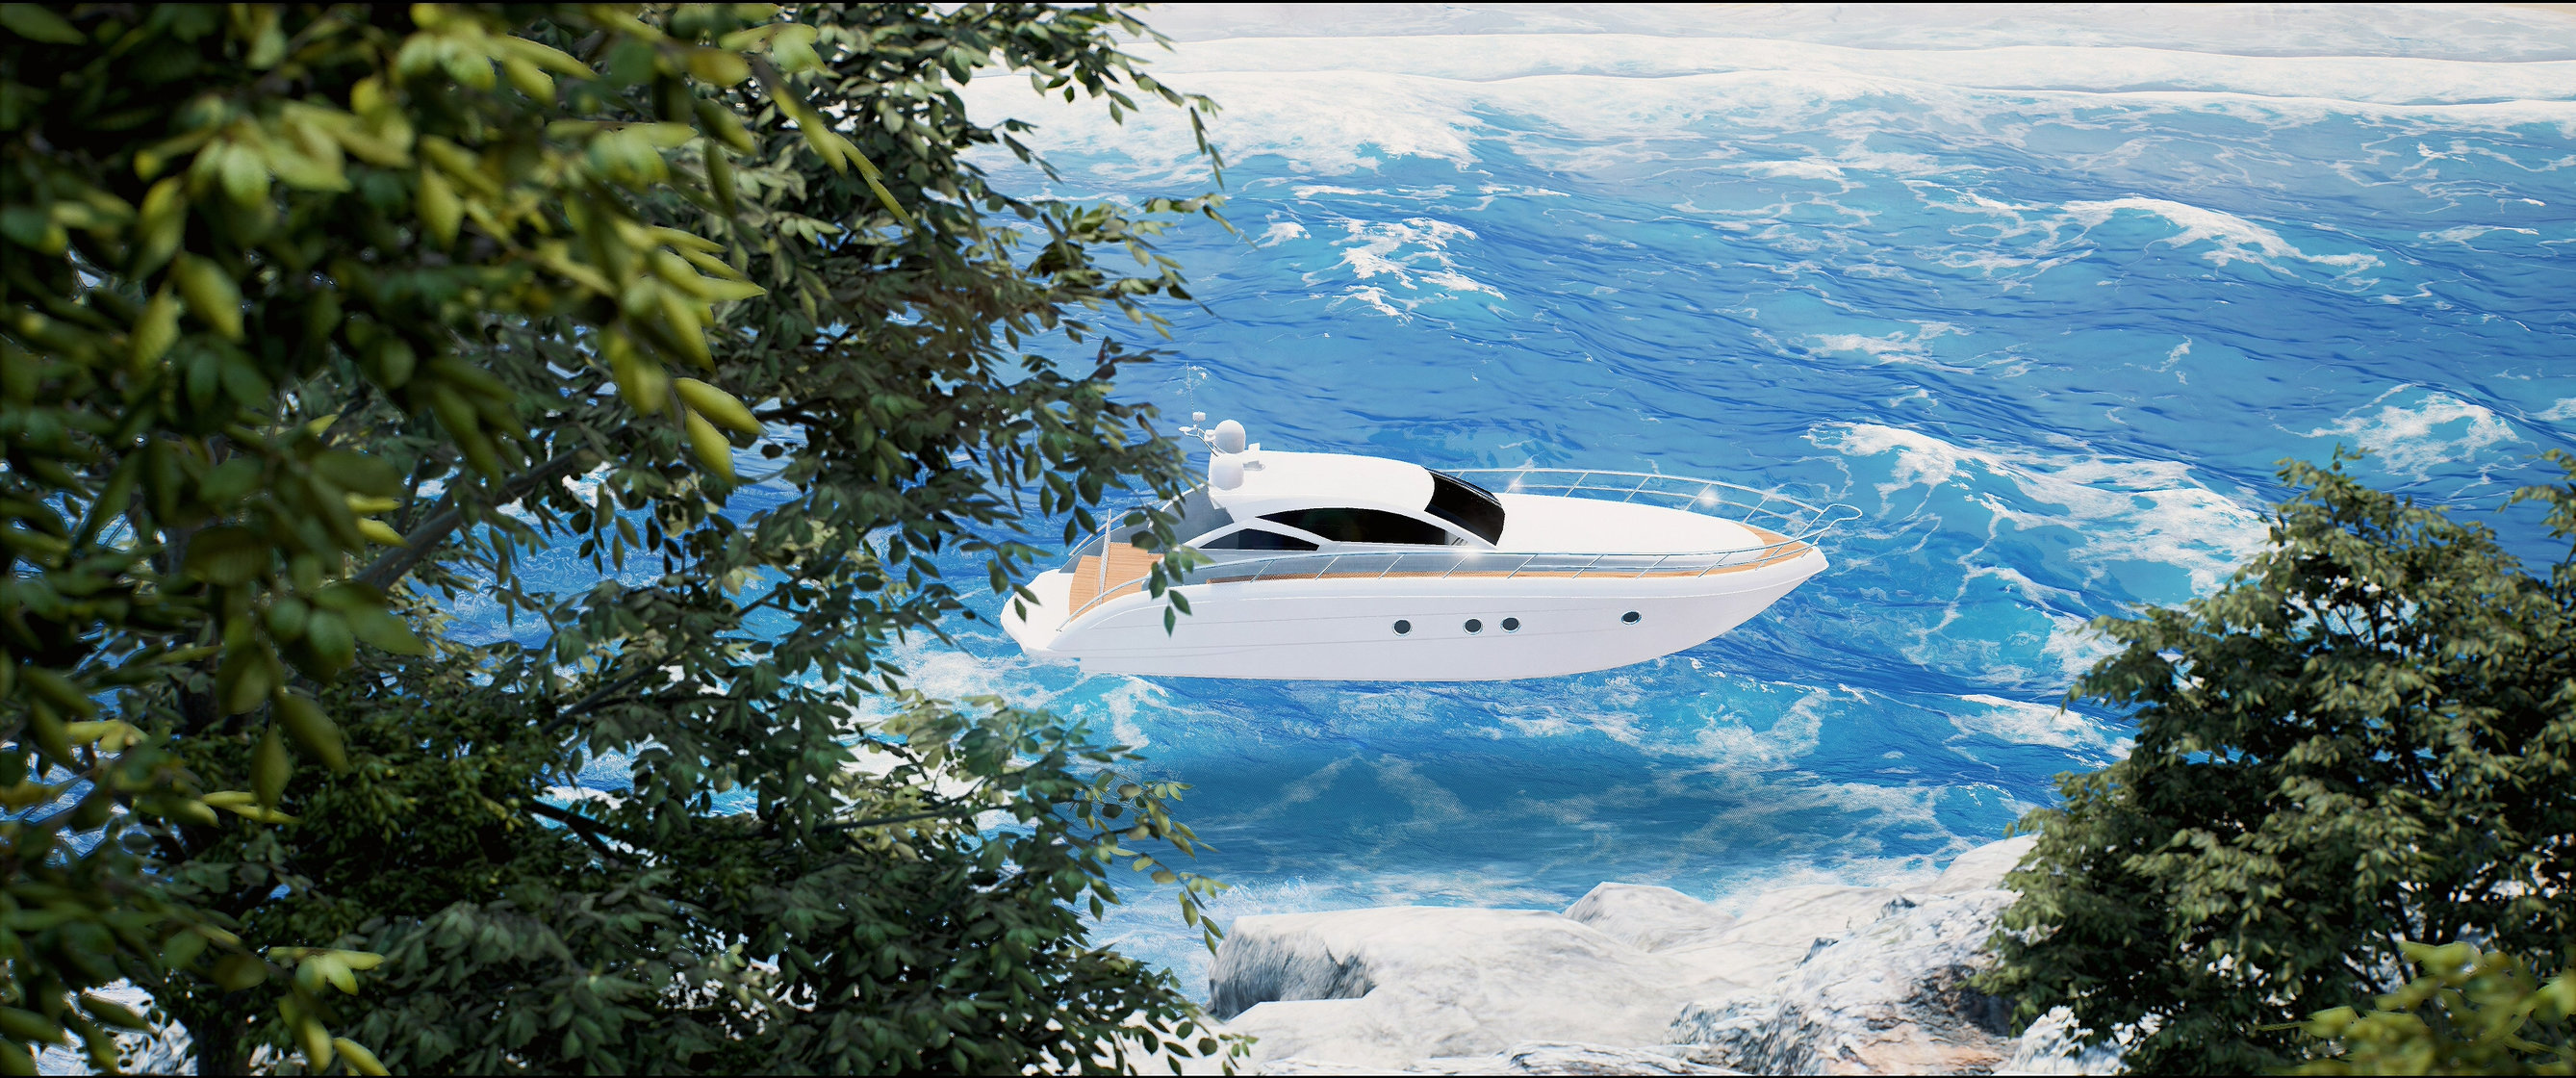 UE4) Nvidia Waveworks study - Sea Restaurant — polycount